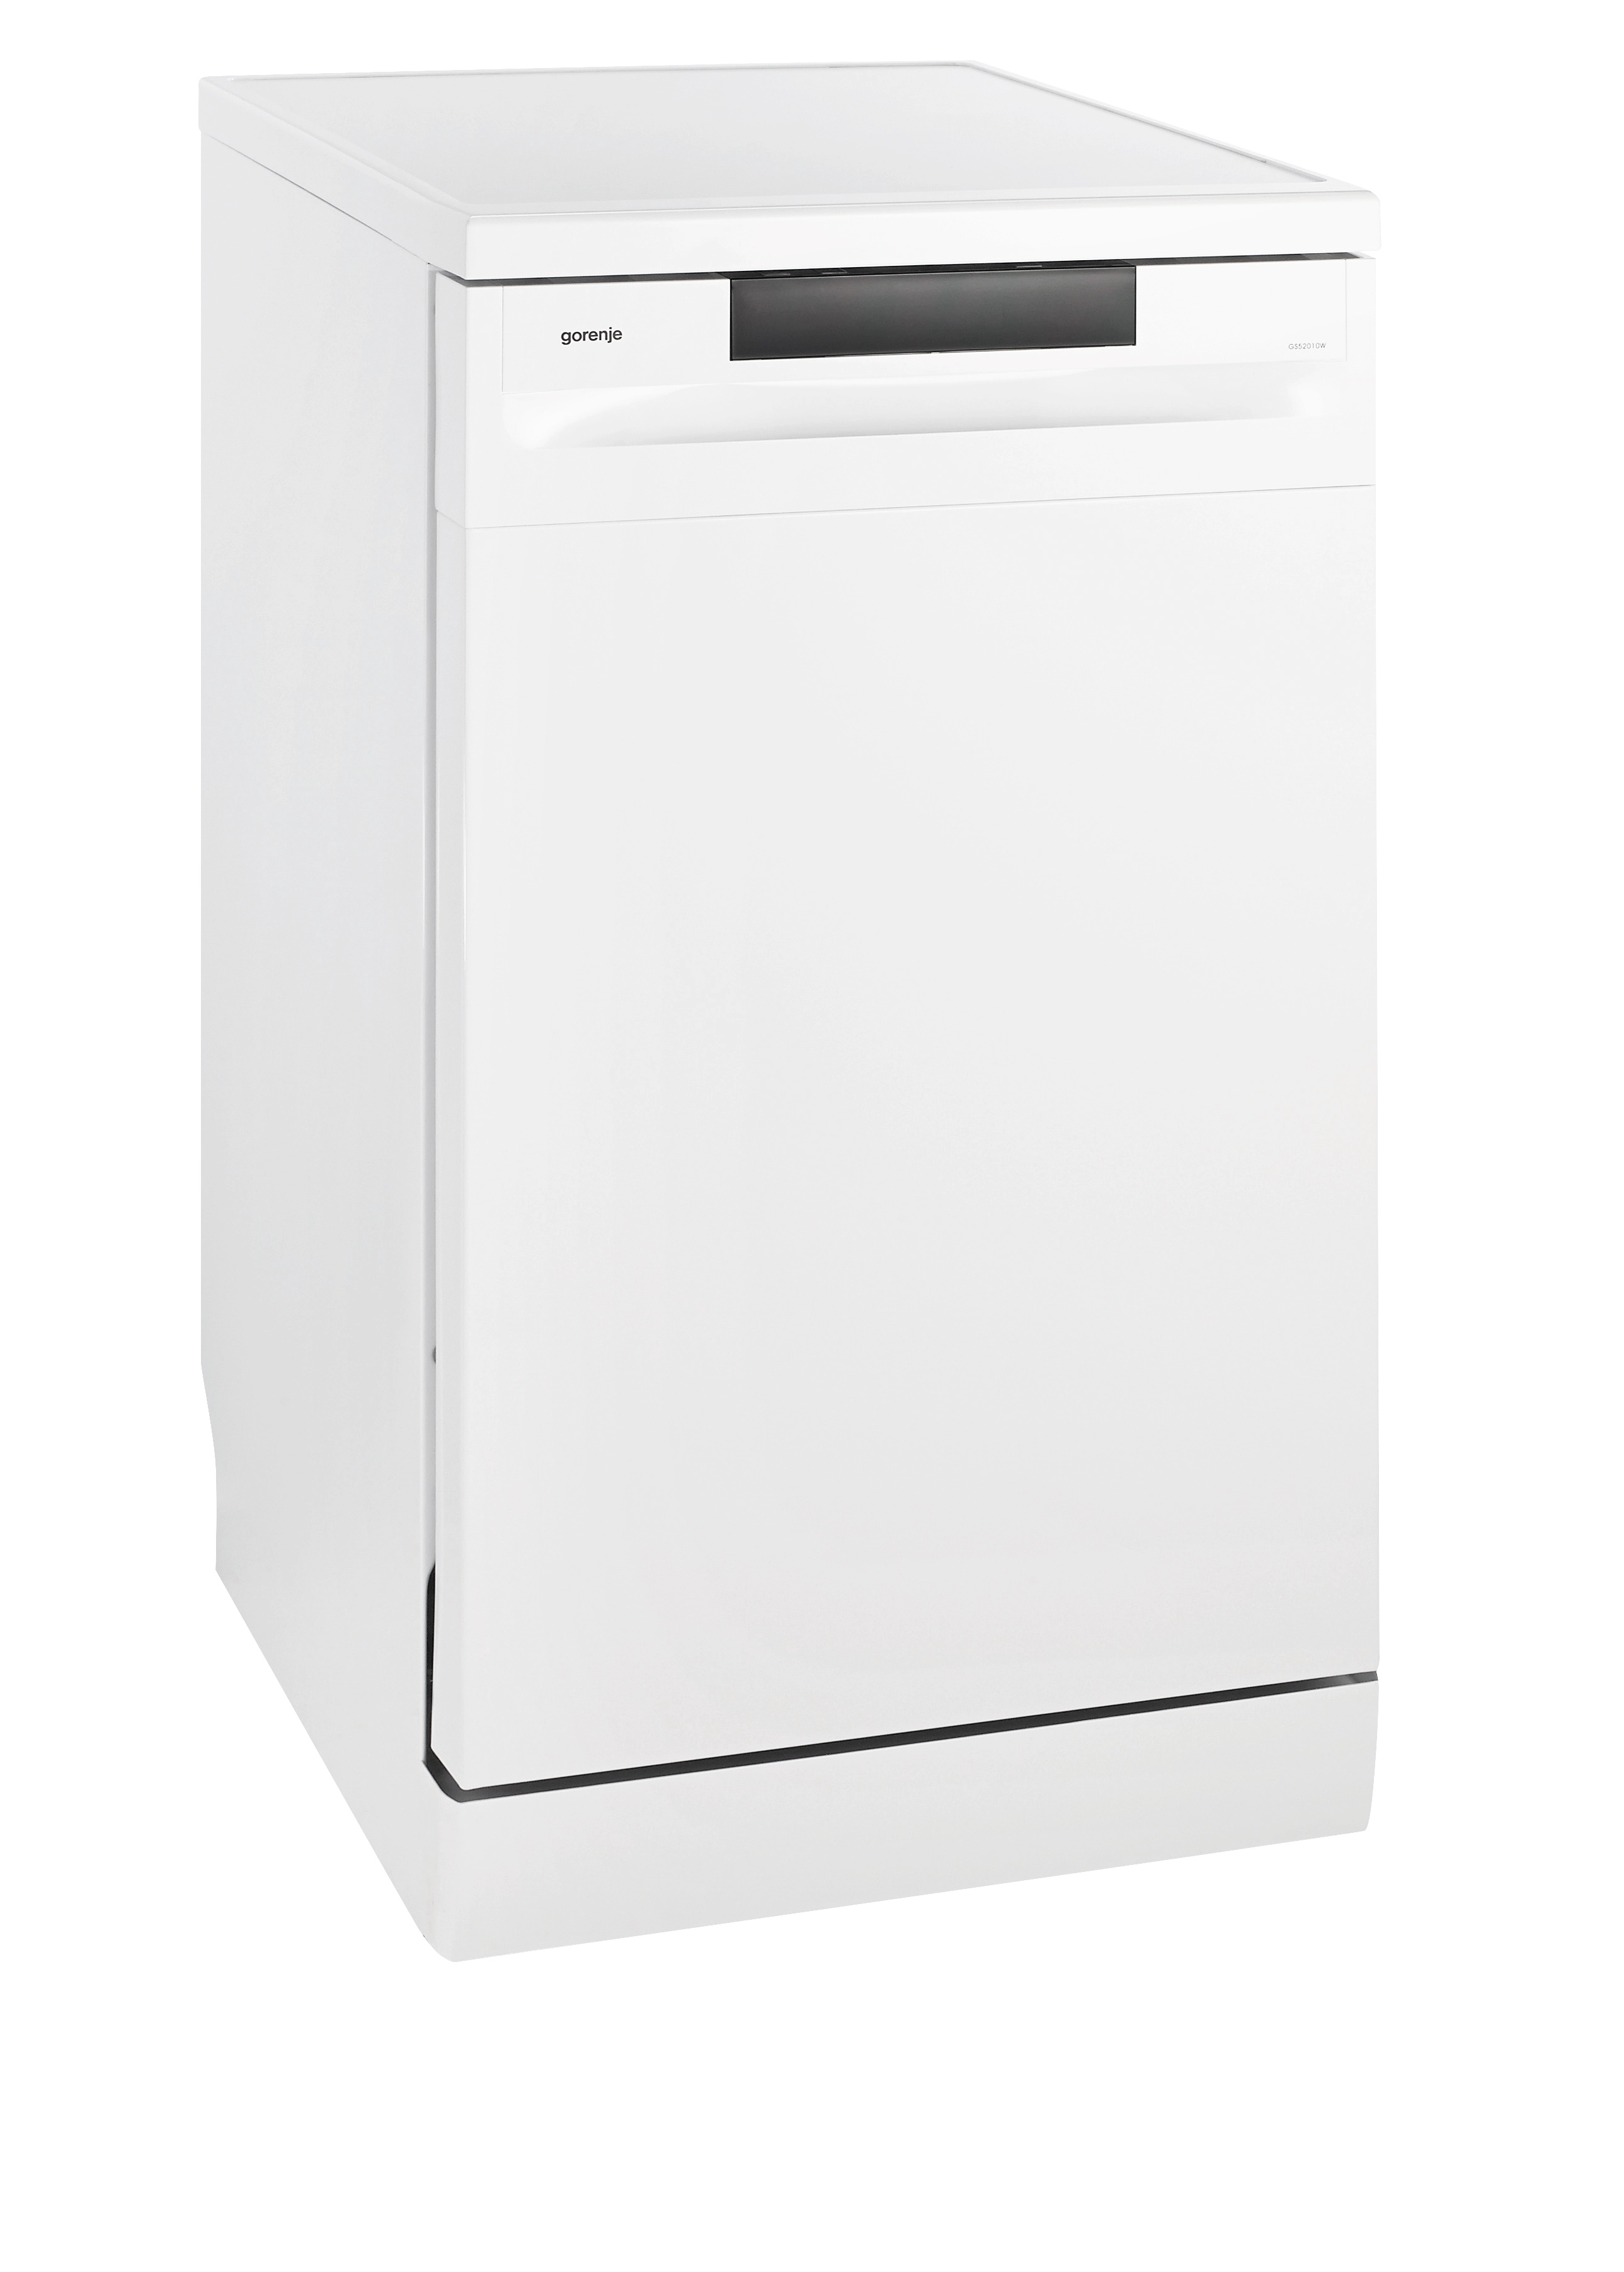 Посудомоечная машина Gorenje GS52010W 56692190633048 - 2